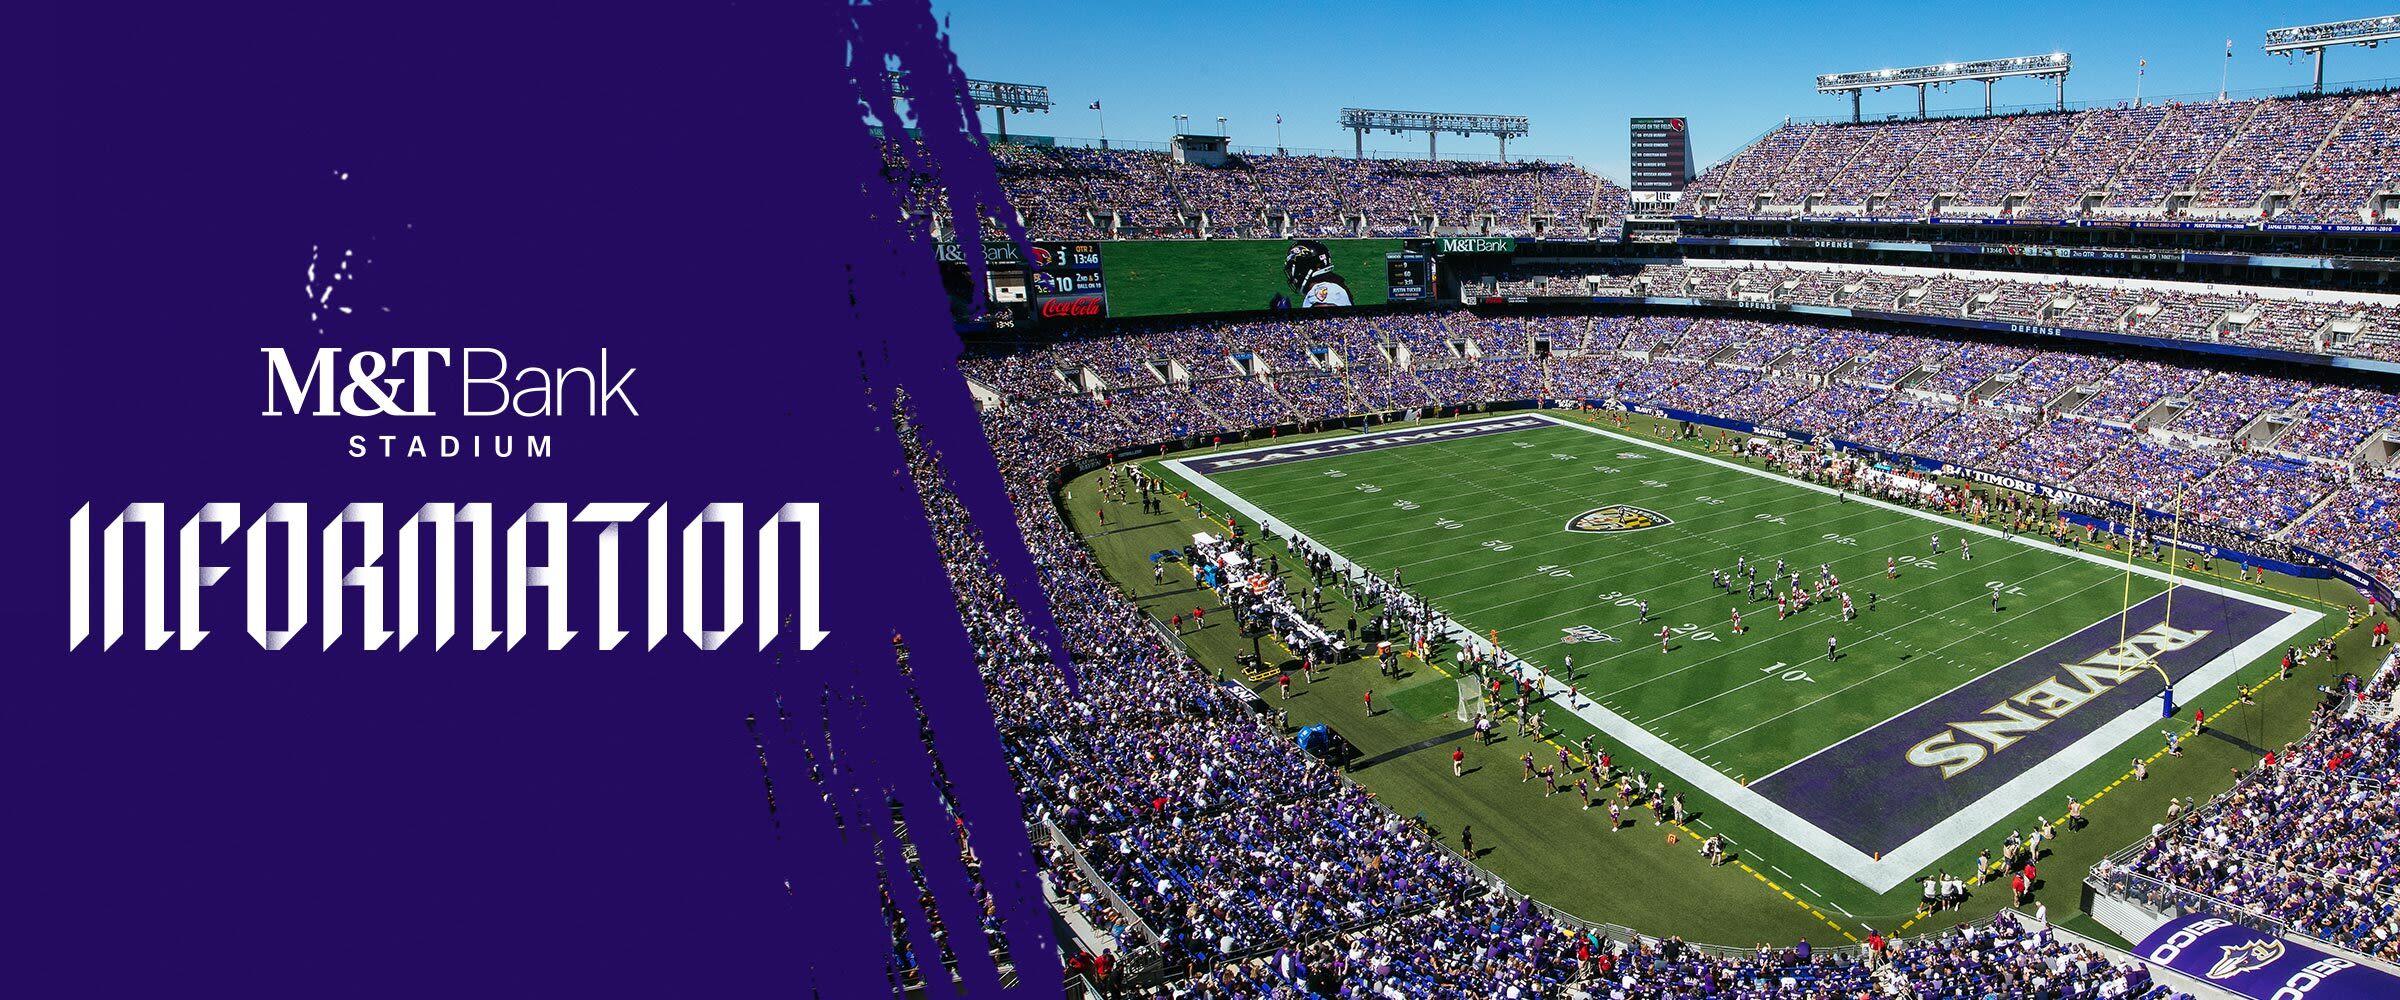 Stadium-Info-Header